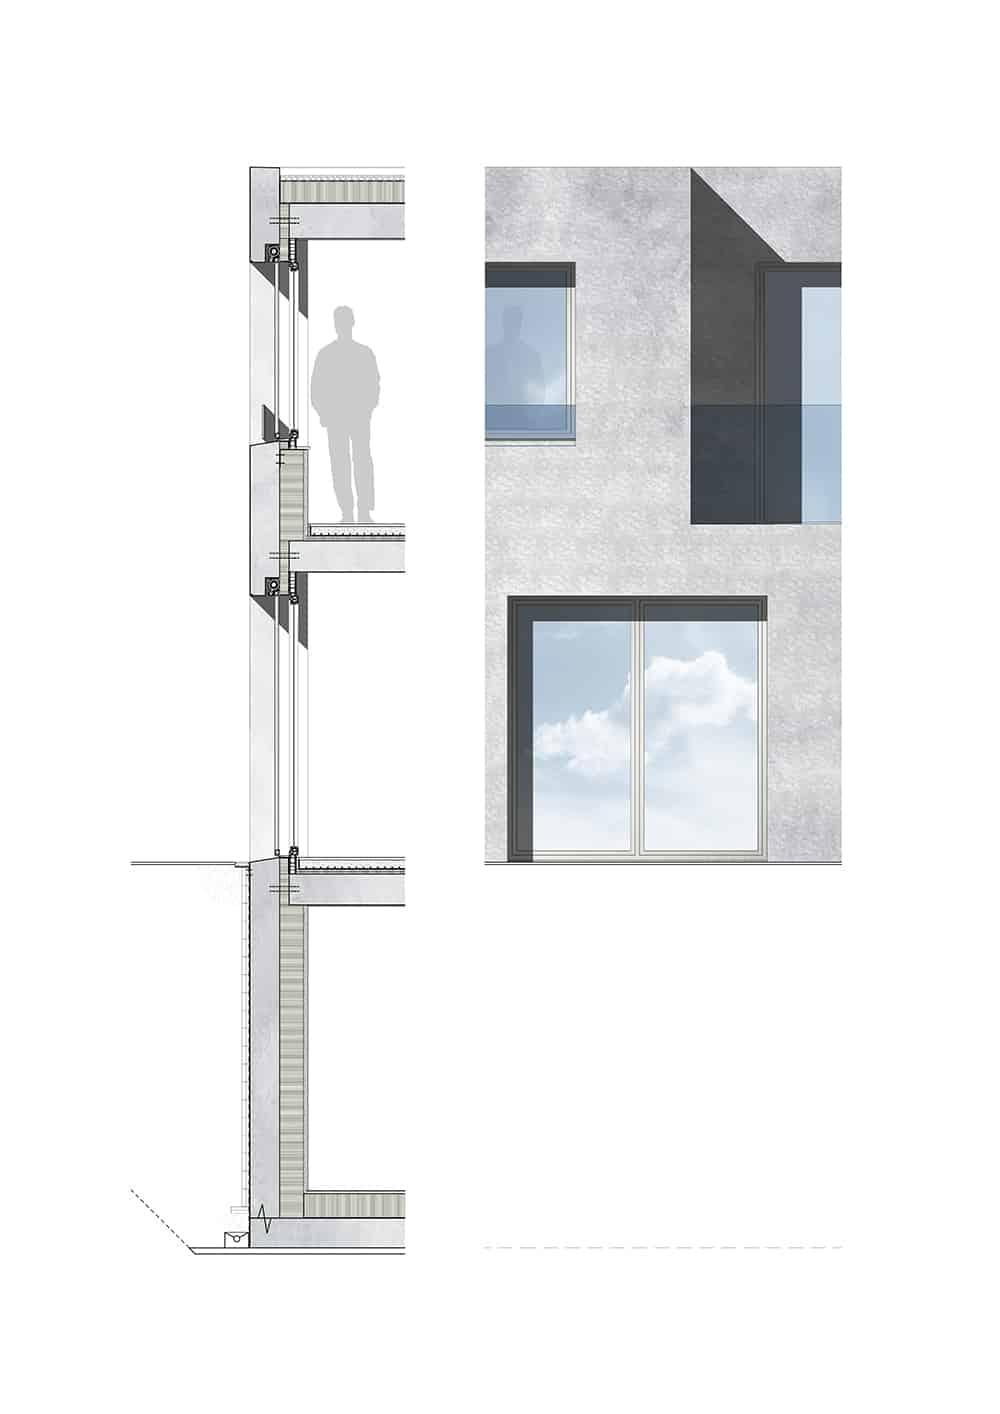 X:Projekte466-Studie OberriedenPläneFassadenschnitt Fassade